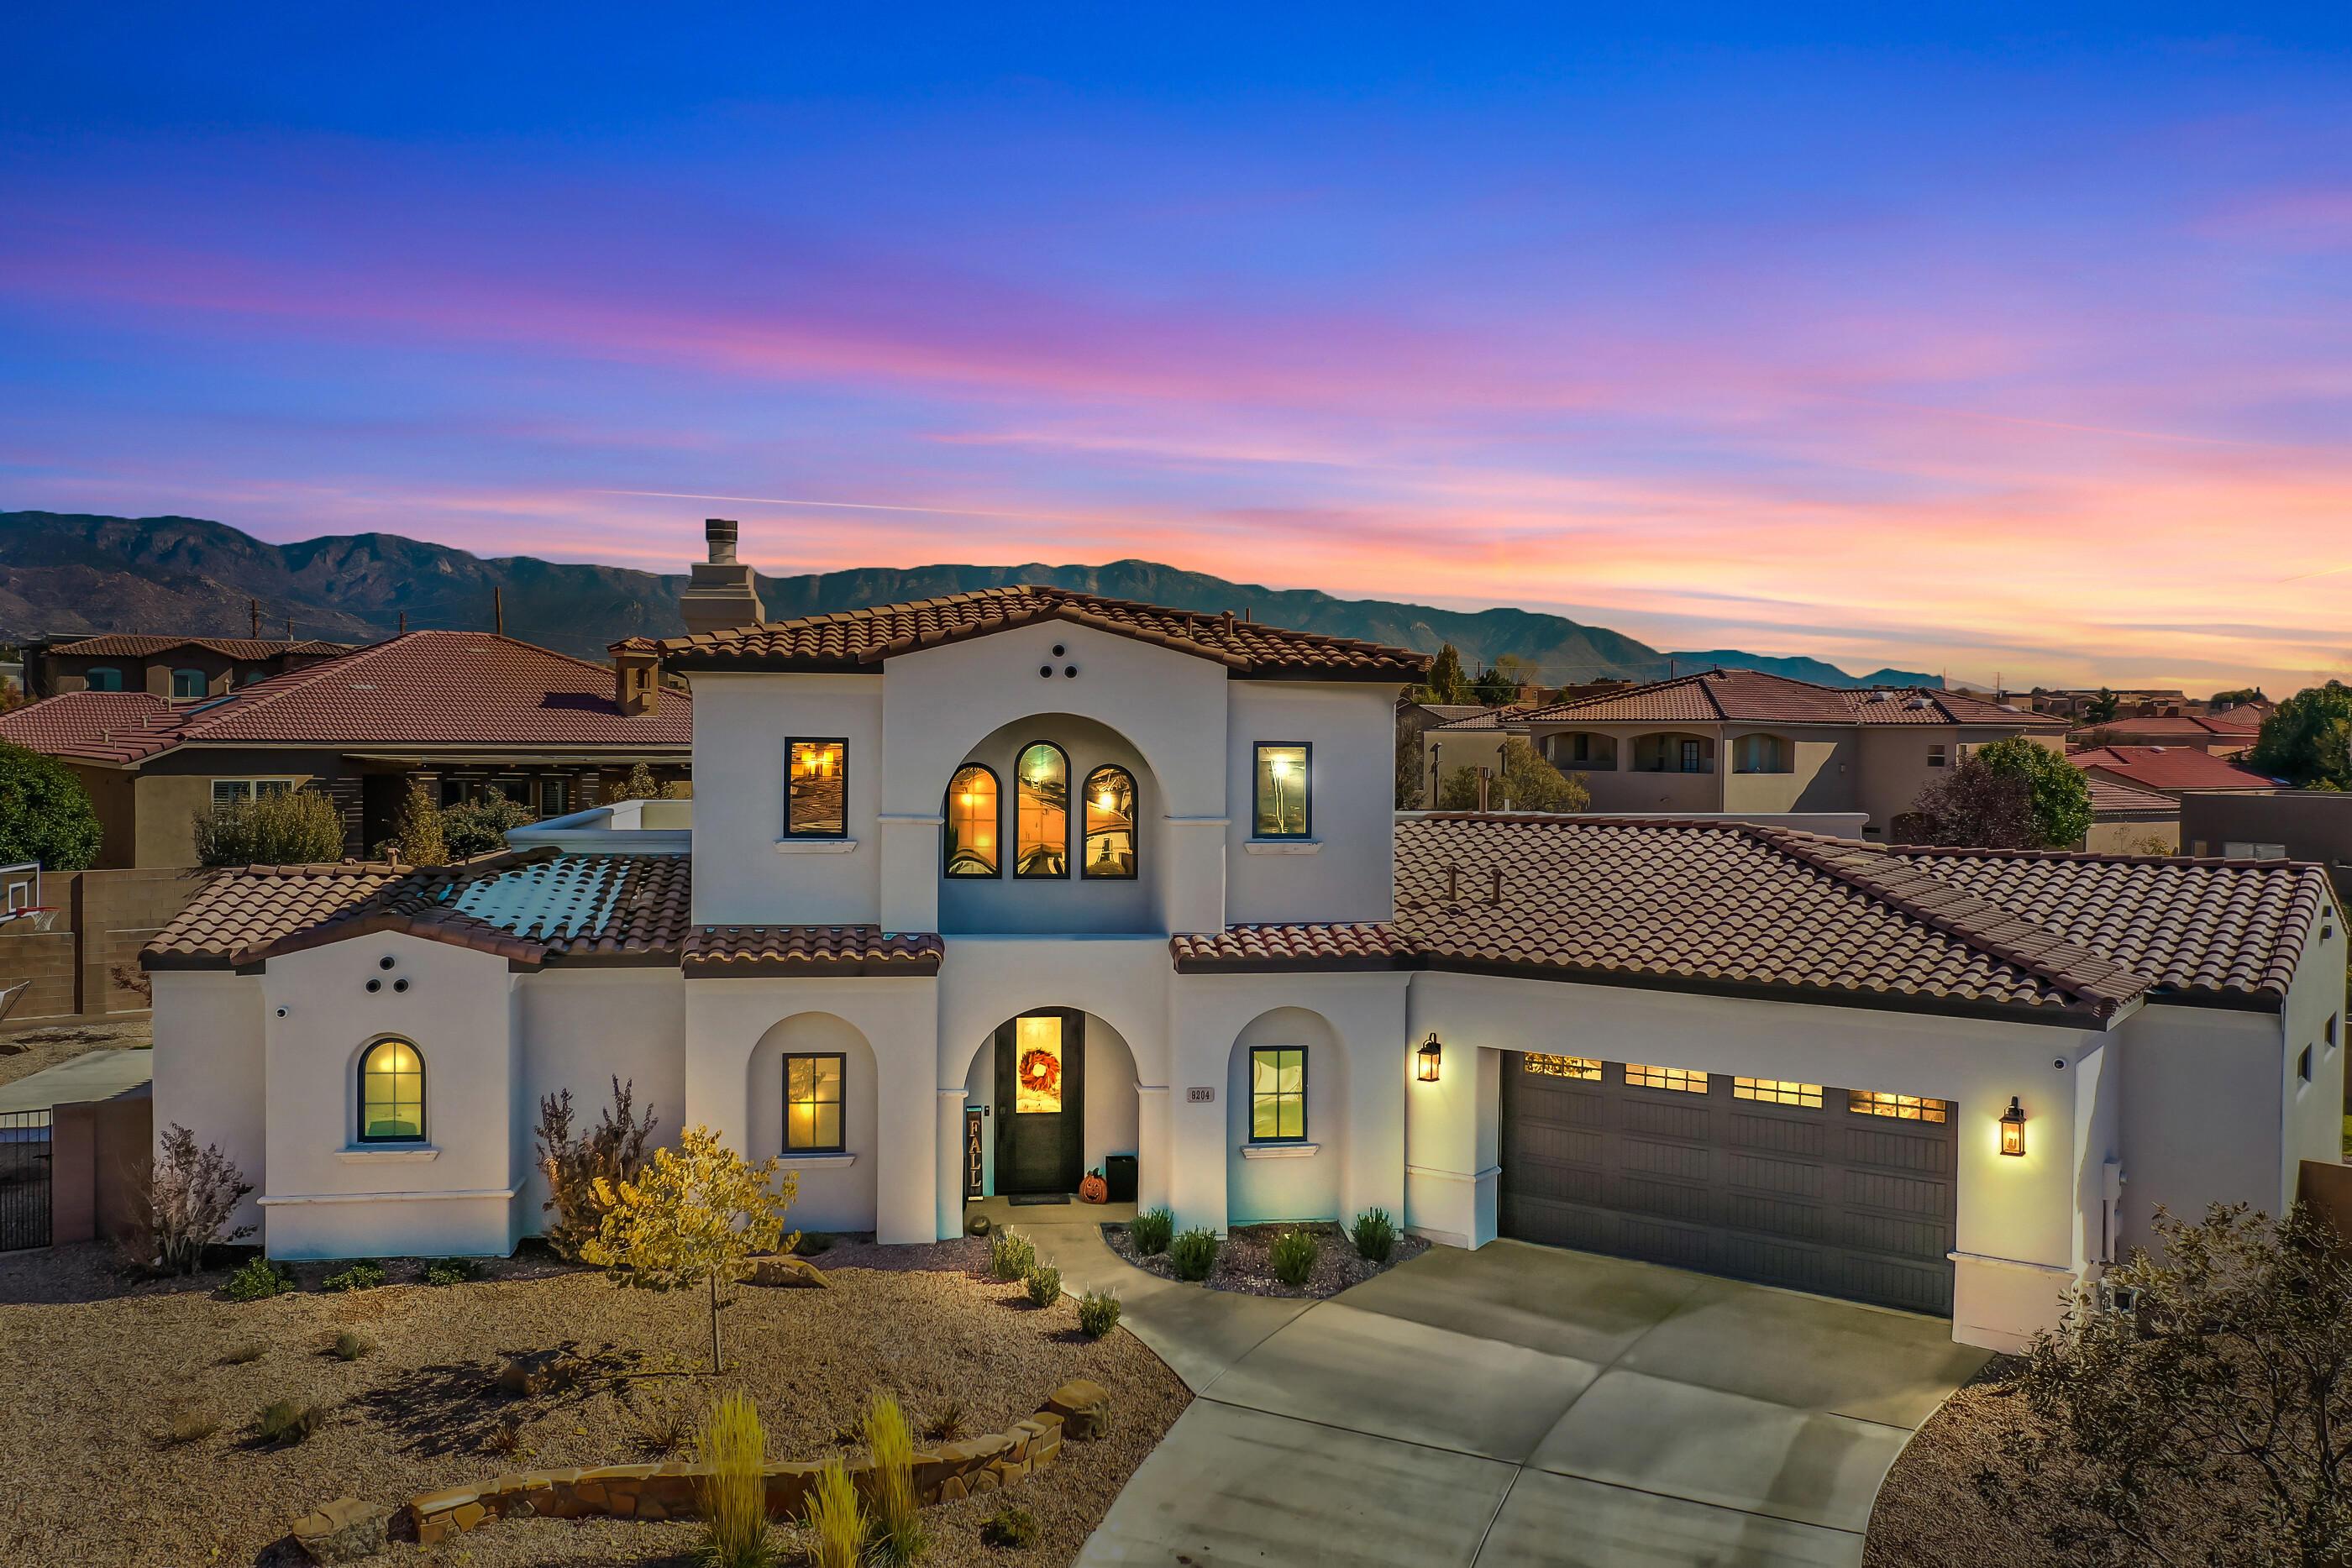 9204 LA TIERRA Court NE Property Photo - Albuquerque, NM real estate listing